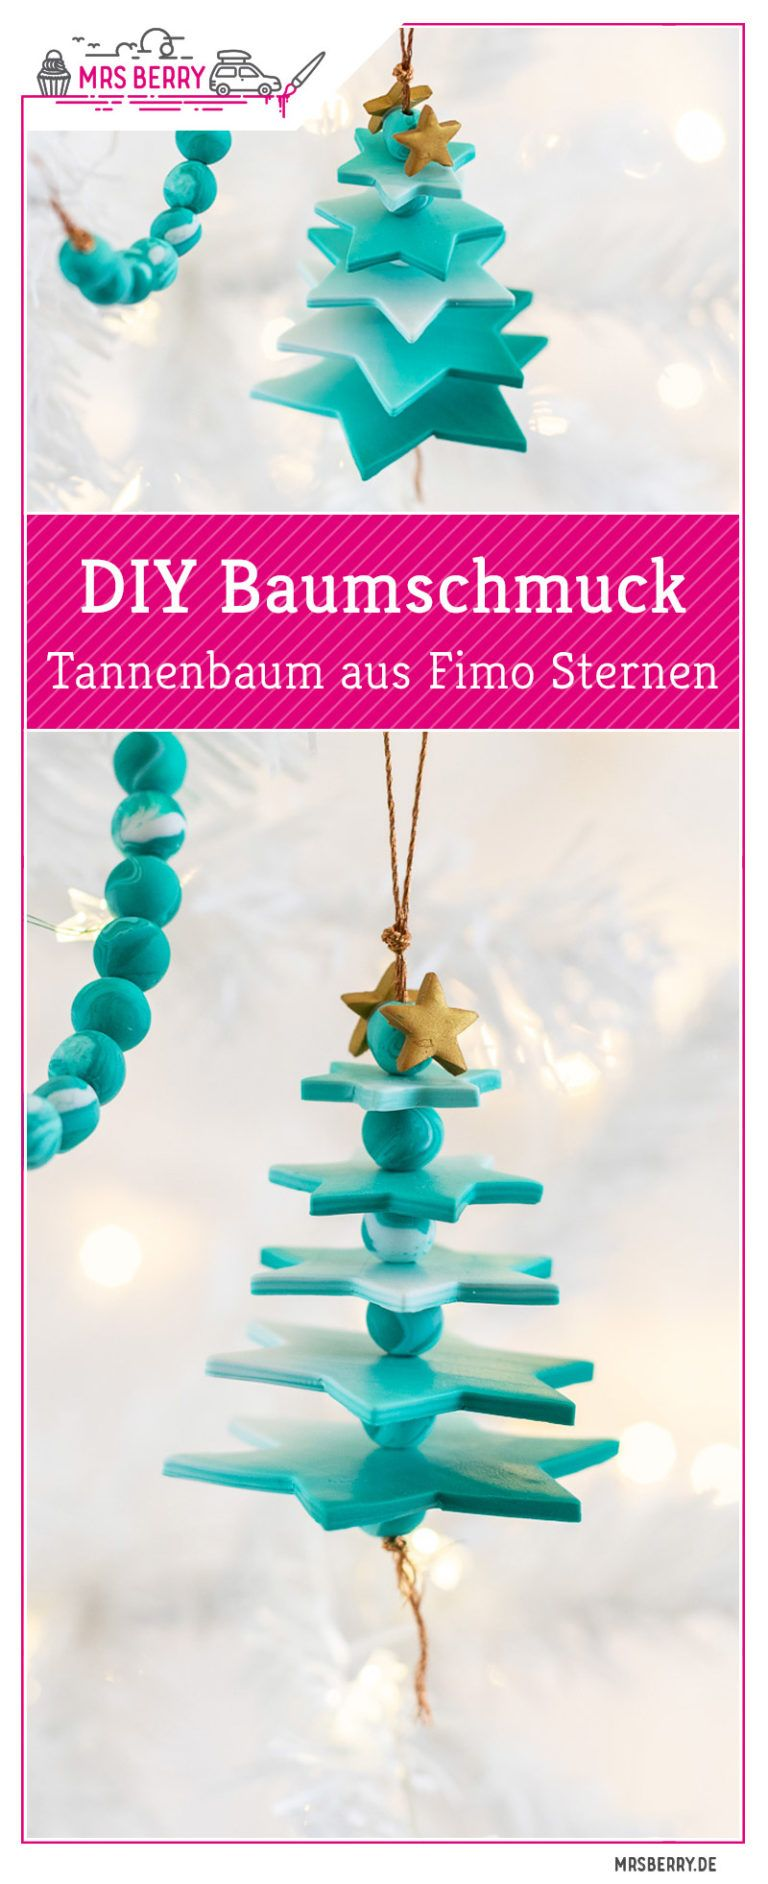 DIY Baumschmuck: Tannenbaum aus Fimo Sternen | MrsBerry.de